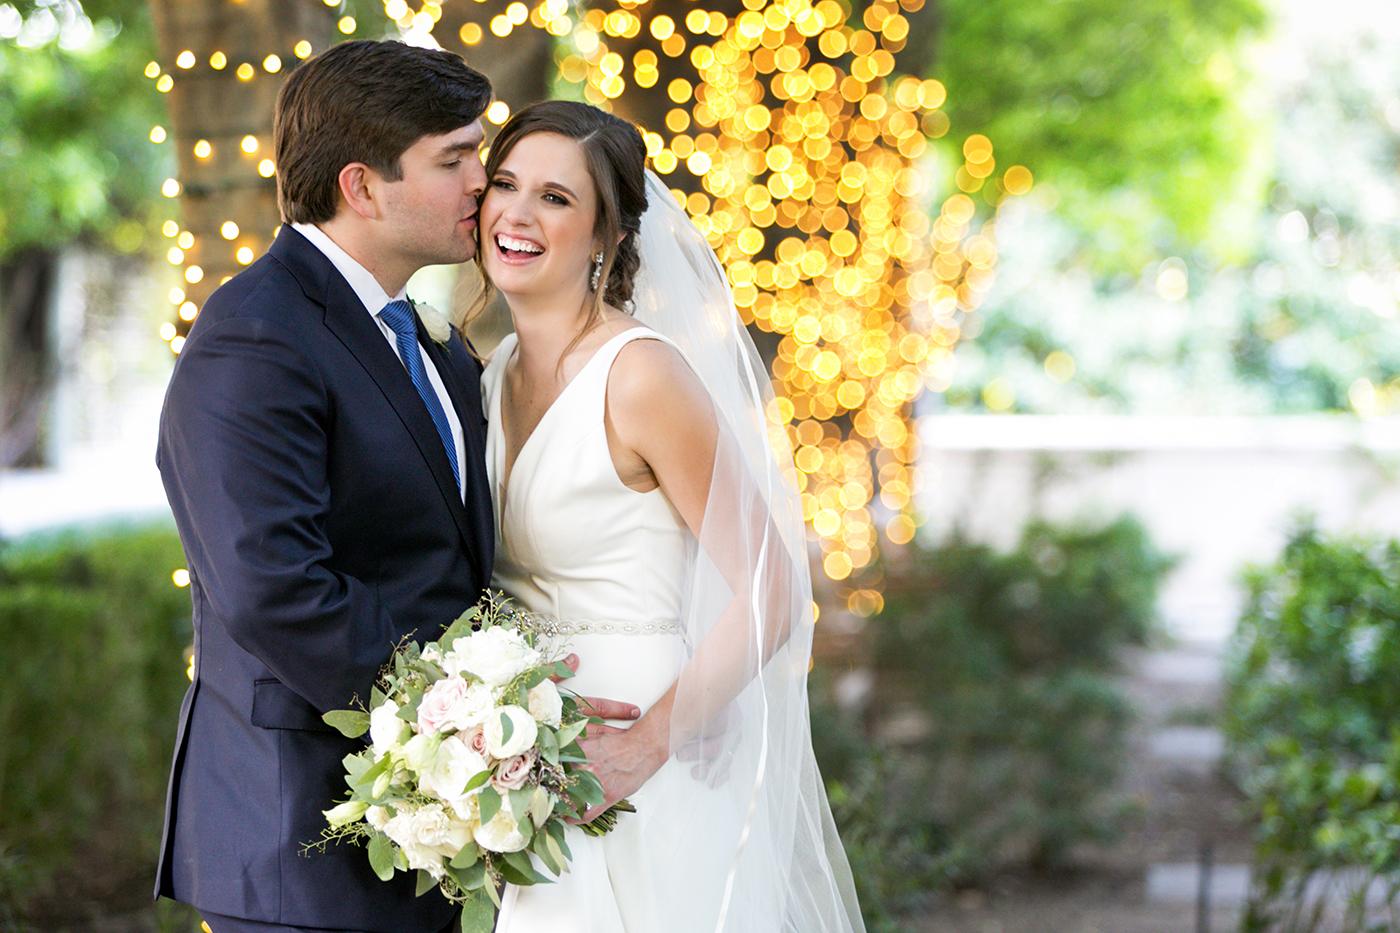 Wedding Planner Dallas TX - Allday Events - Highland Park - Marie Gabrielle Wedding - 279.jpg